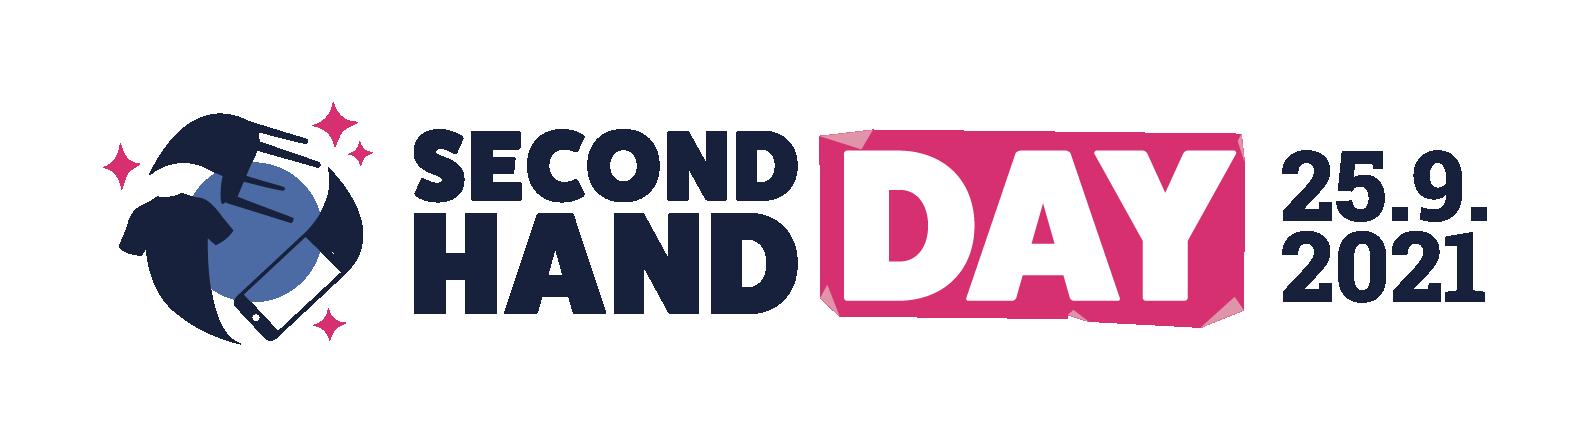 secondhand_day_logo_rework_2021_rgb_quer_datum-1